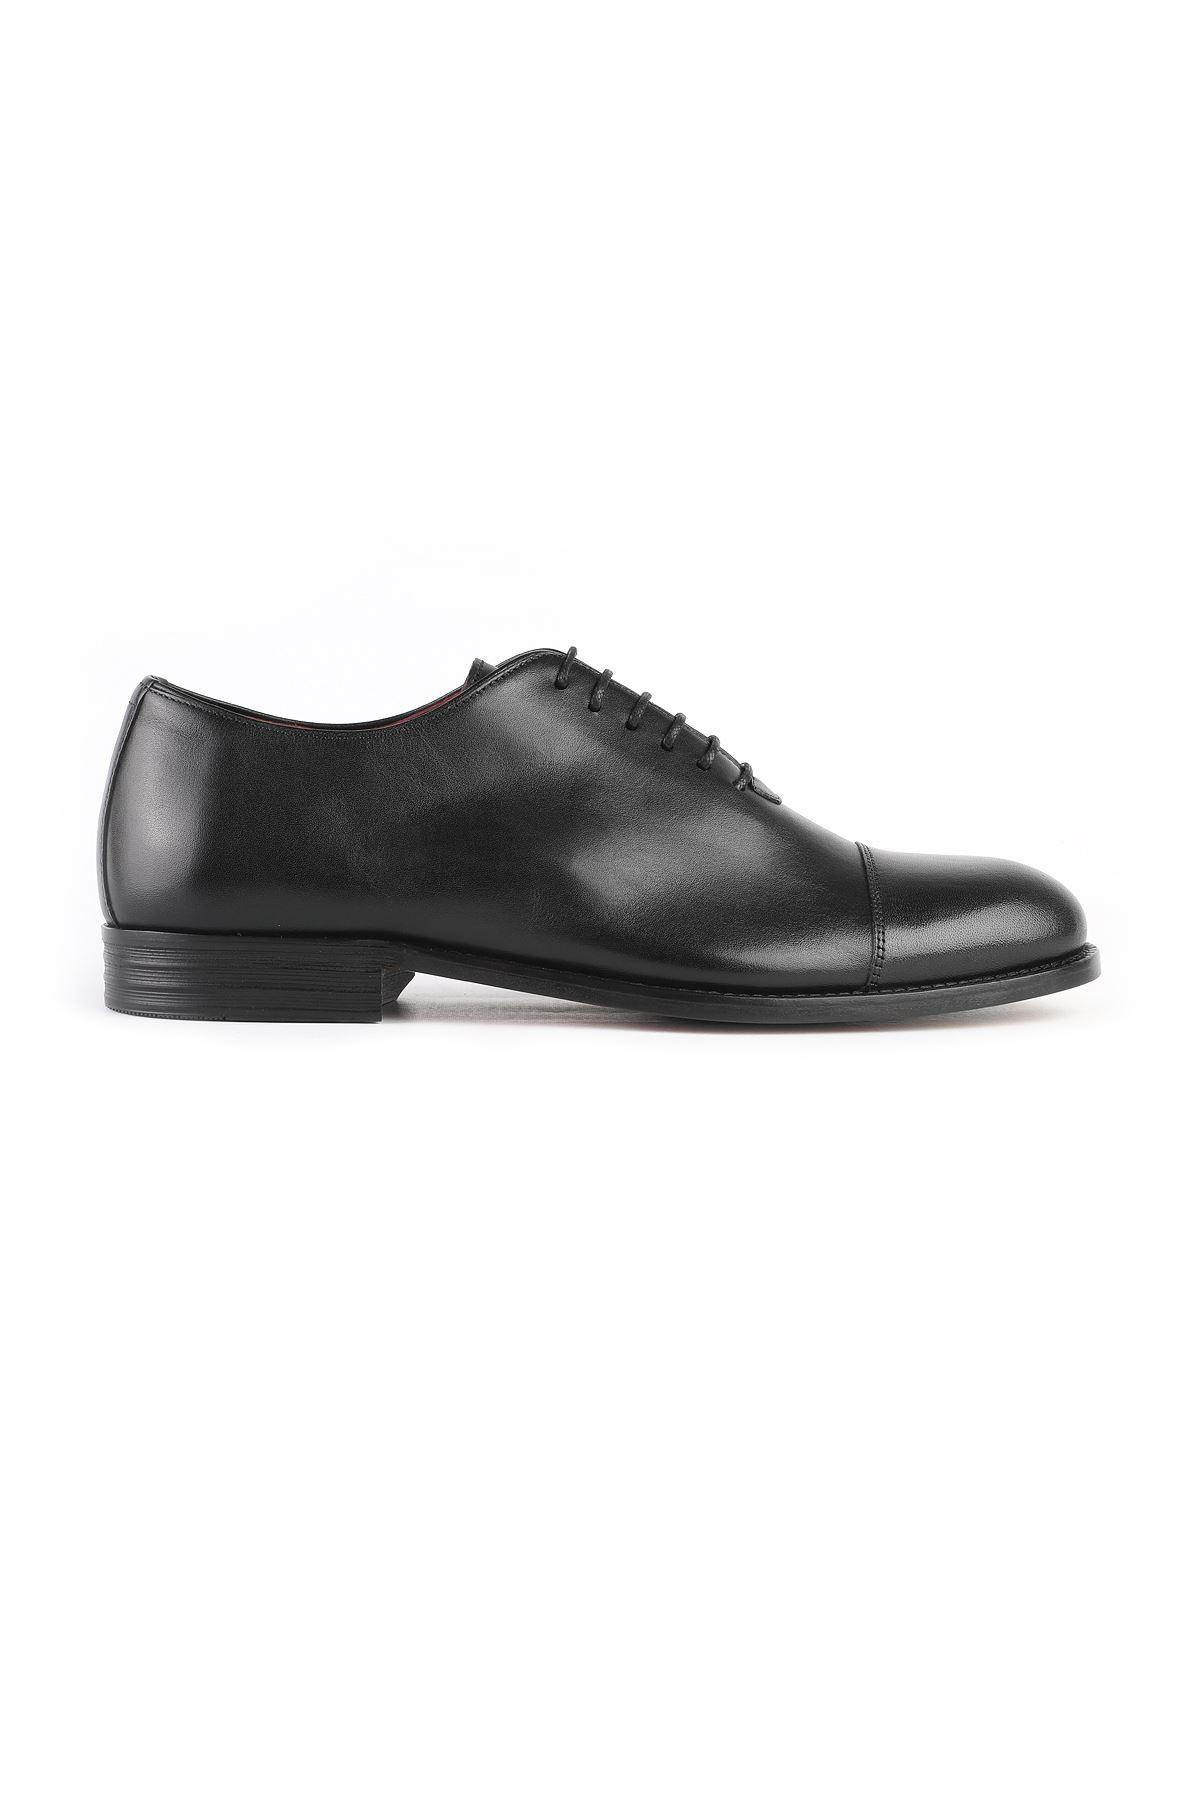 Libero 3212 Black Classic Shoes